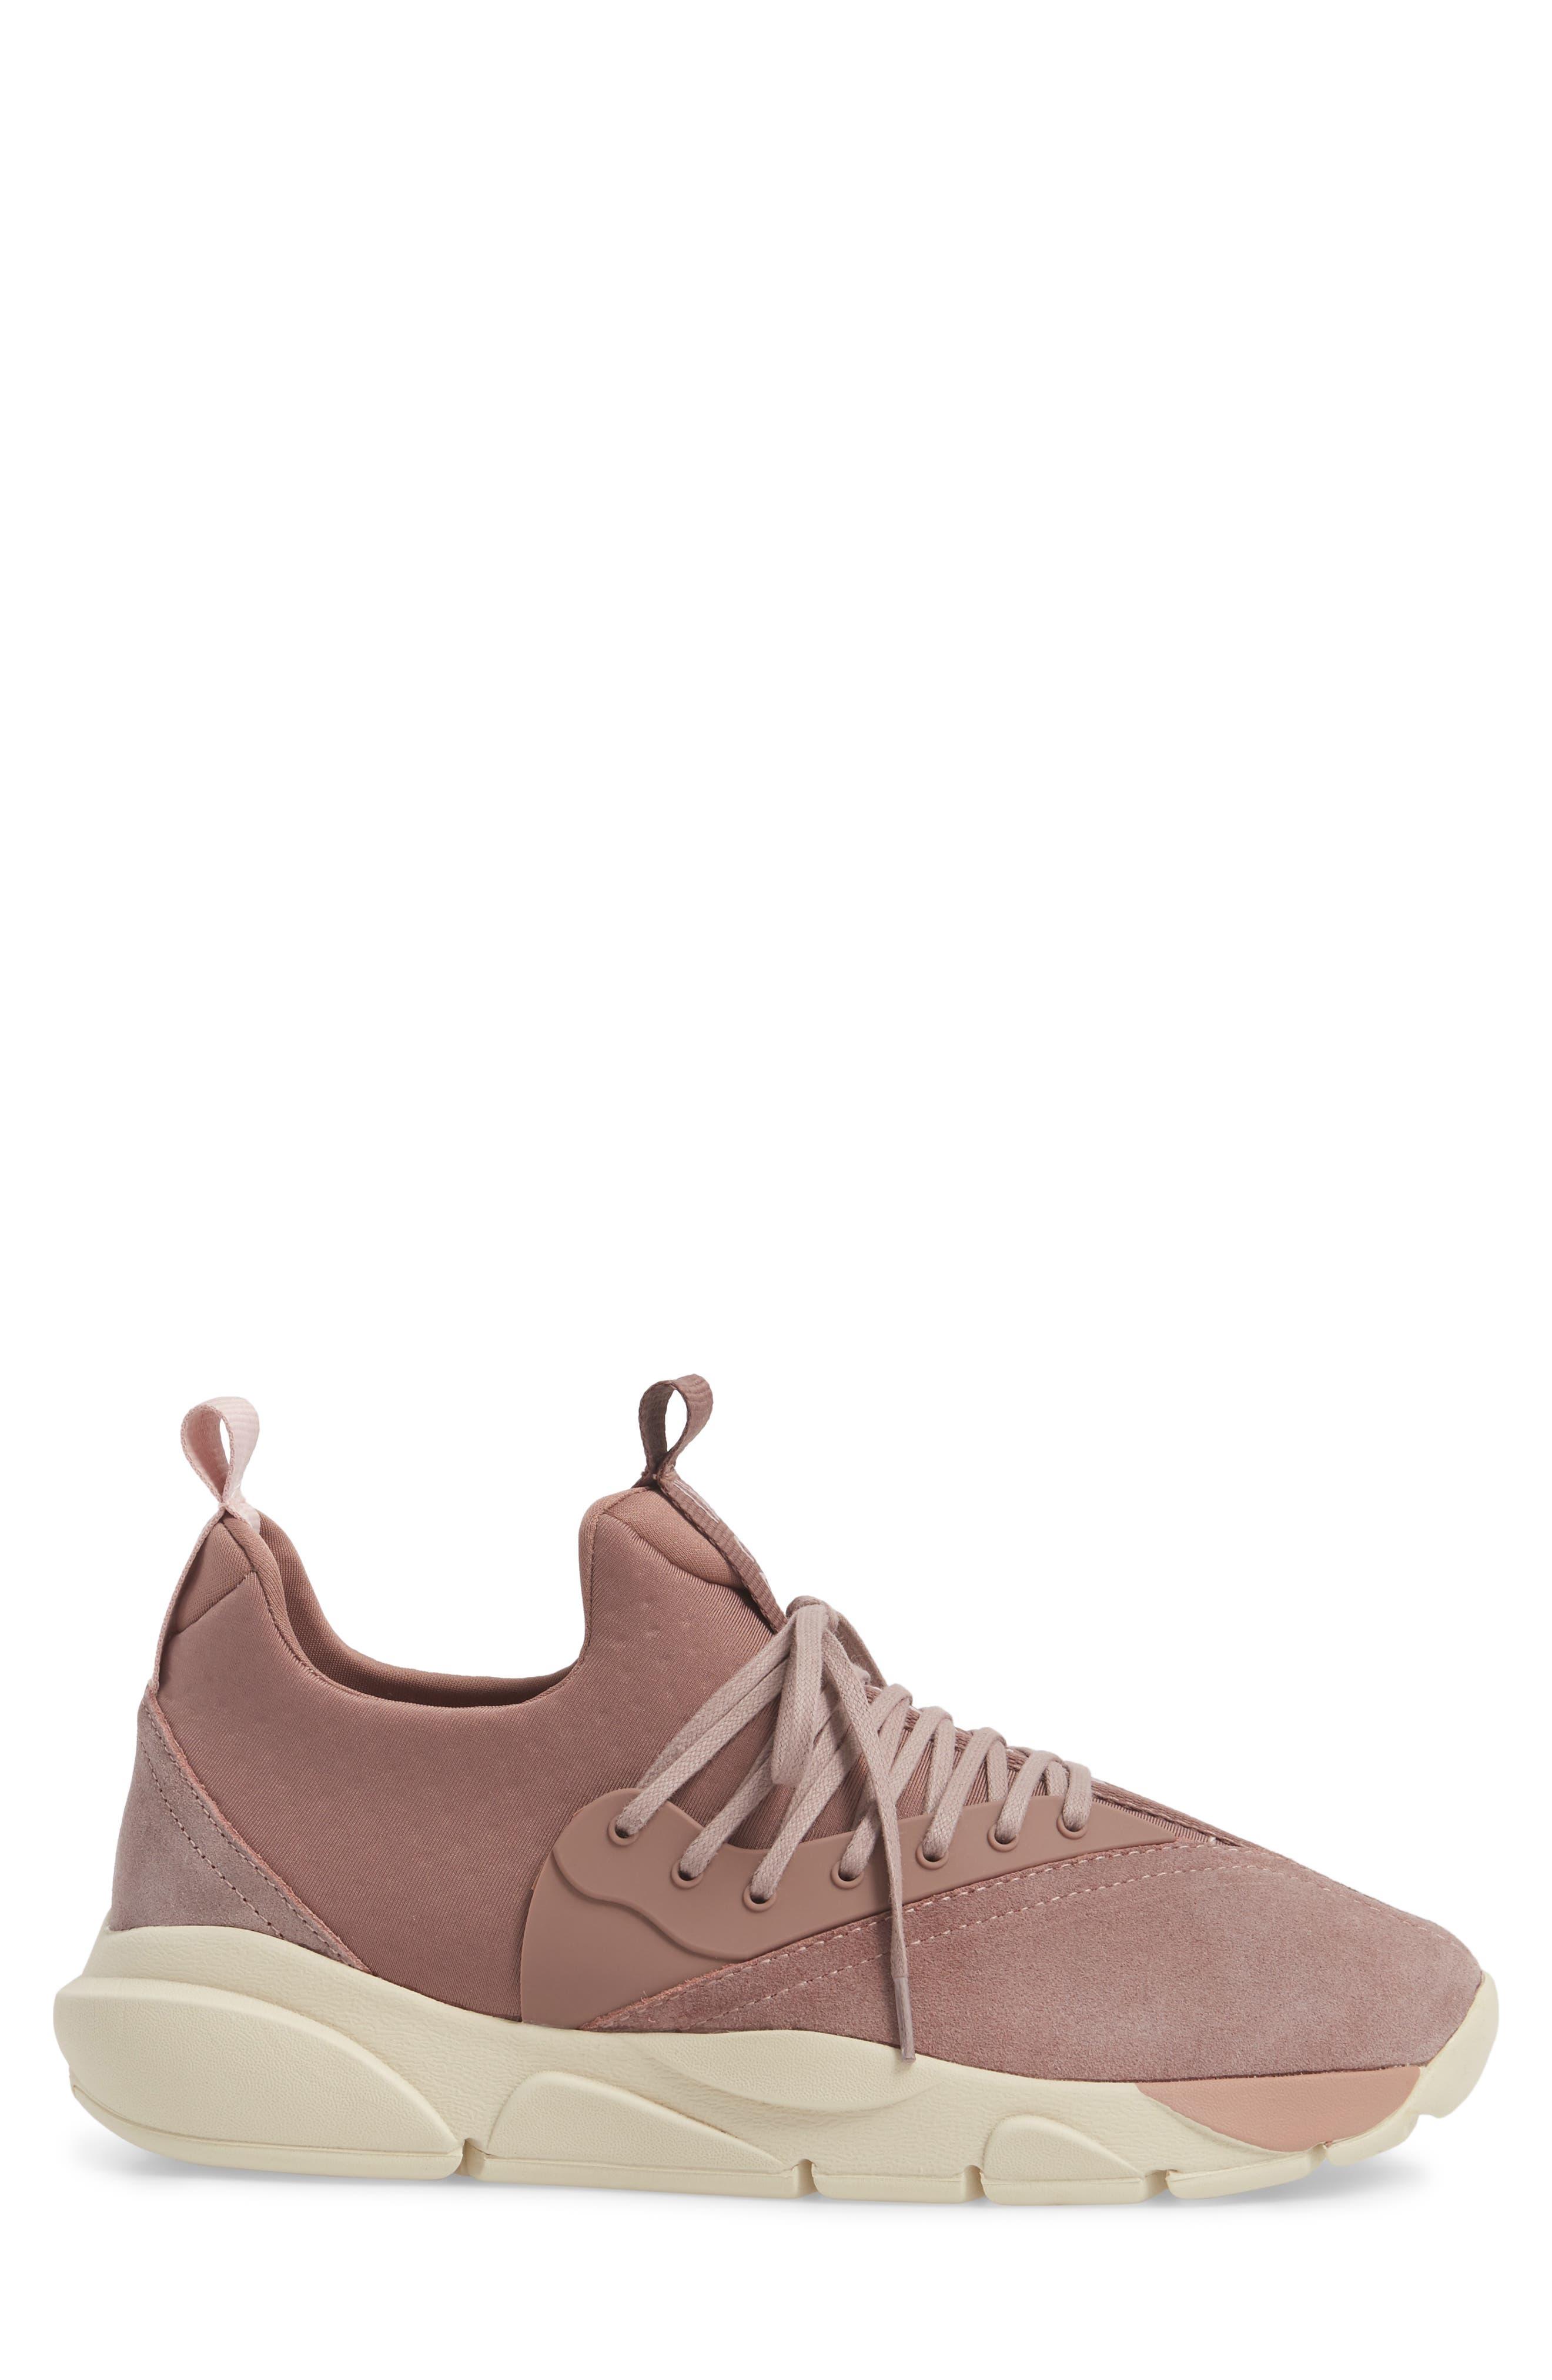 The Cloud Stryke Sneaker,                             Alternate thumbnail 3, color,                             Antler Pink